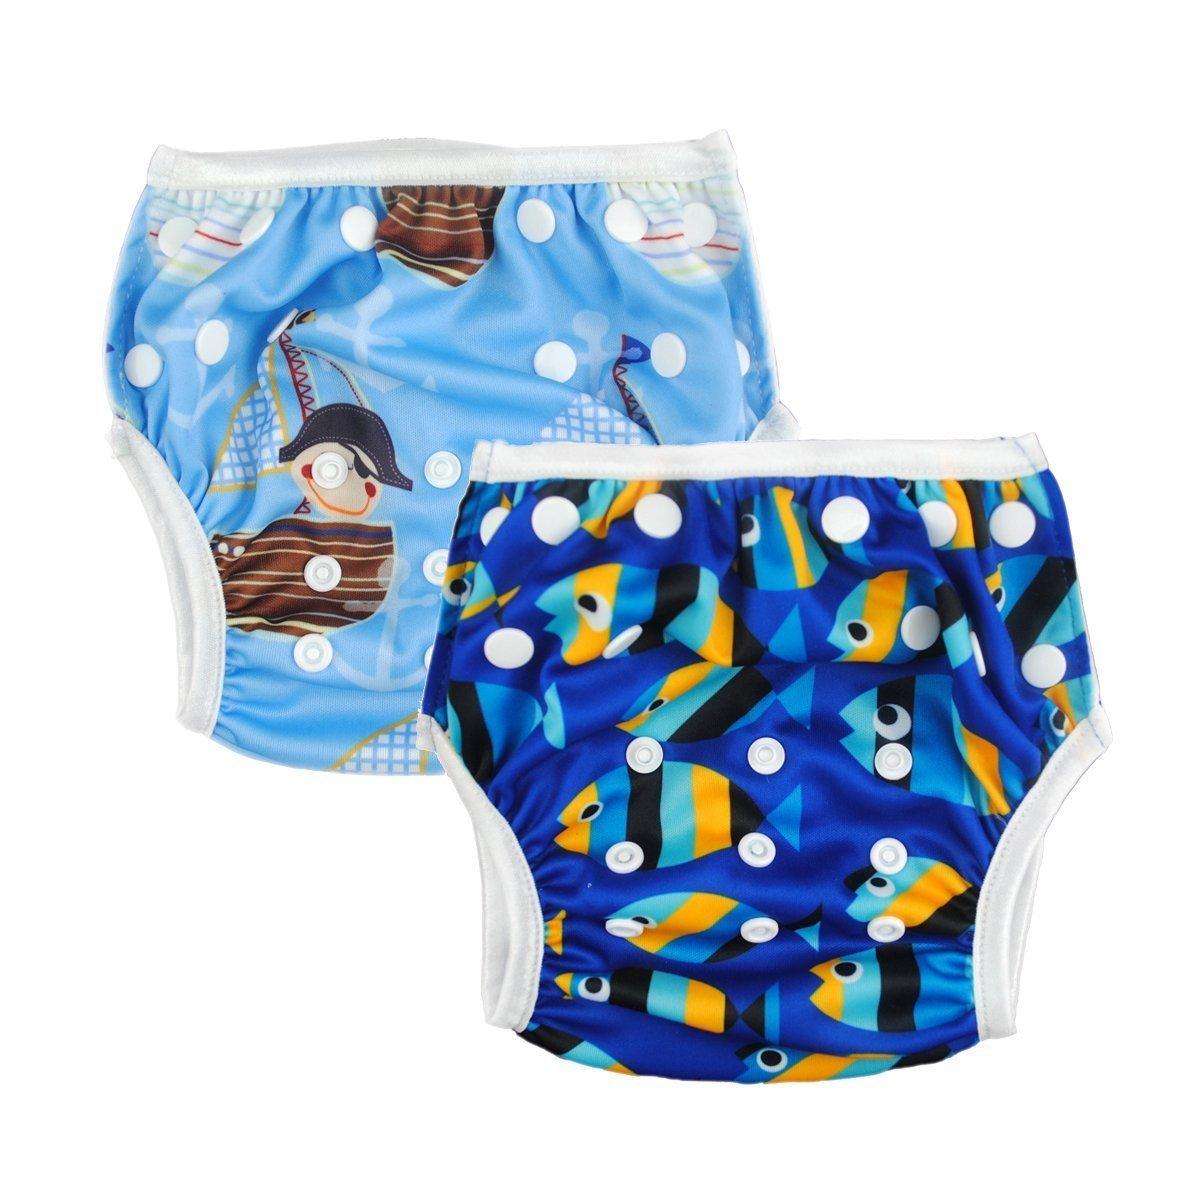 Alva Baby 2pcs Pack Big One Size Reuseable Washable Swim Diapers ZSW03-04 Alvababy ZSW03-04-347